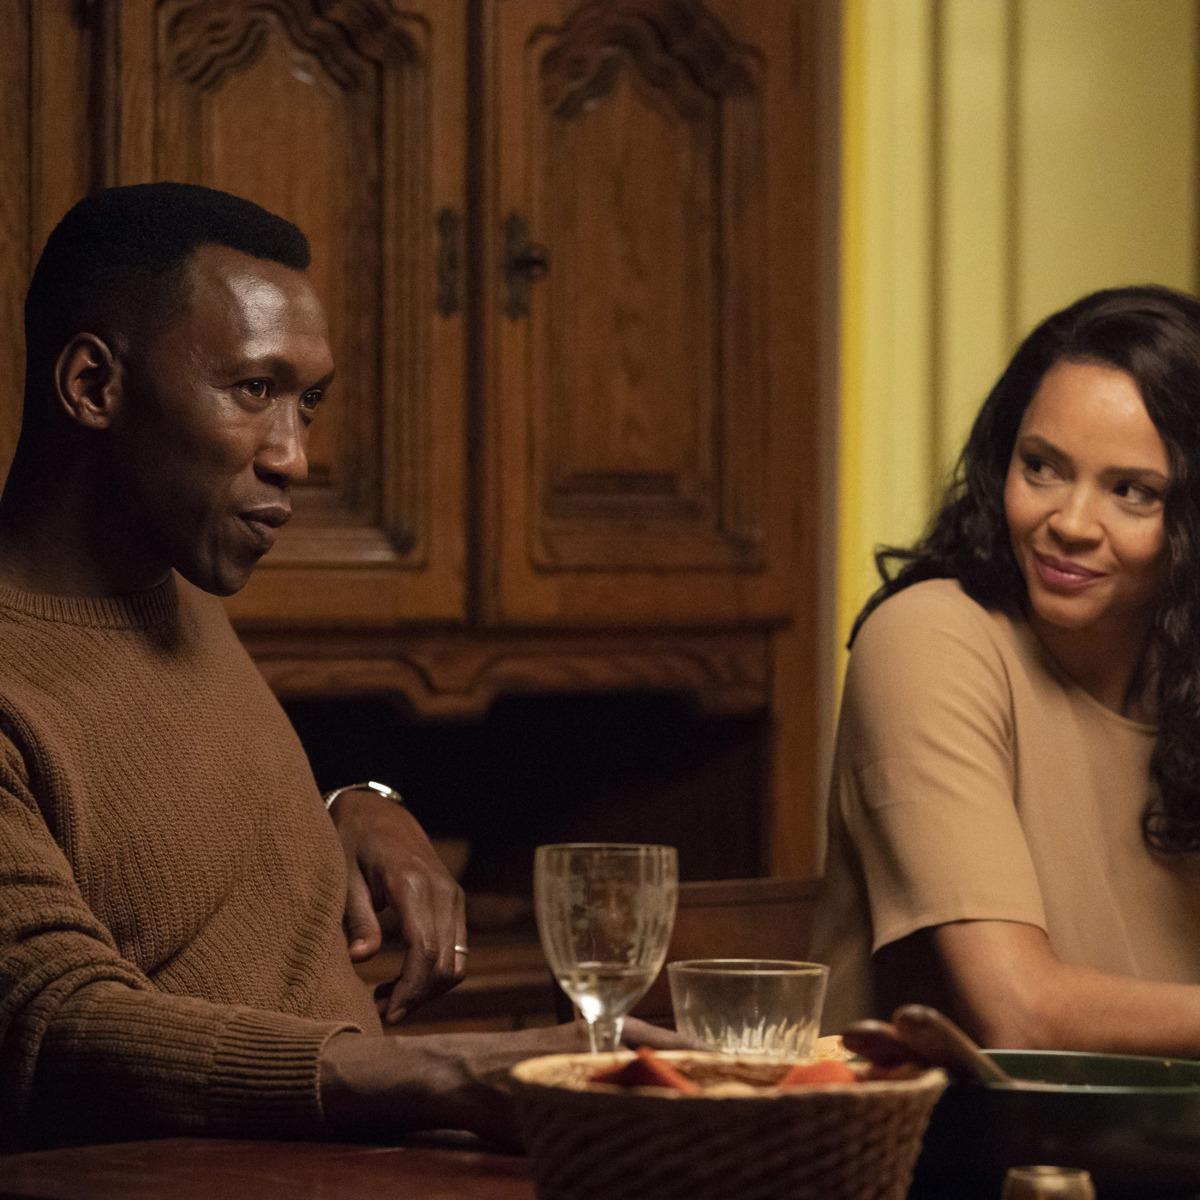 True Detective Season 3, Episode 5 Recap: If You Have Ghosts